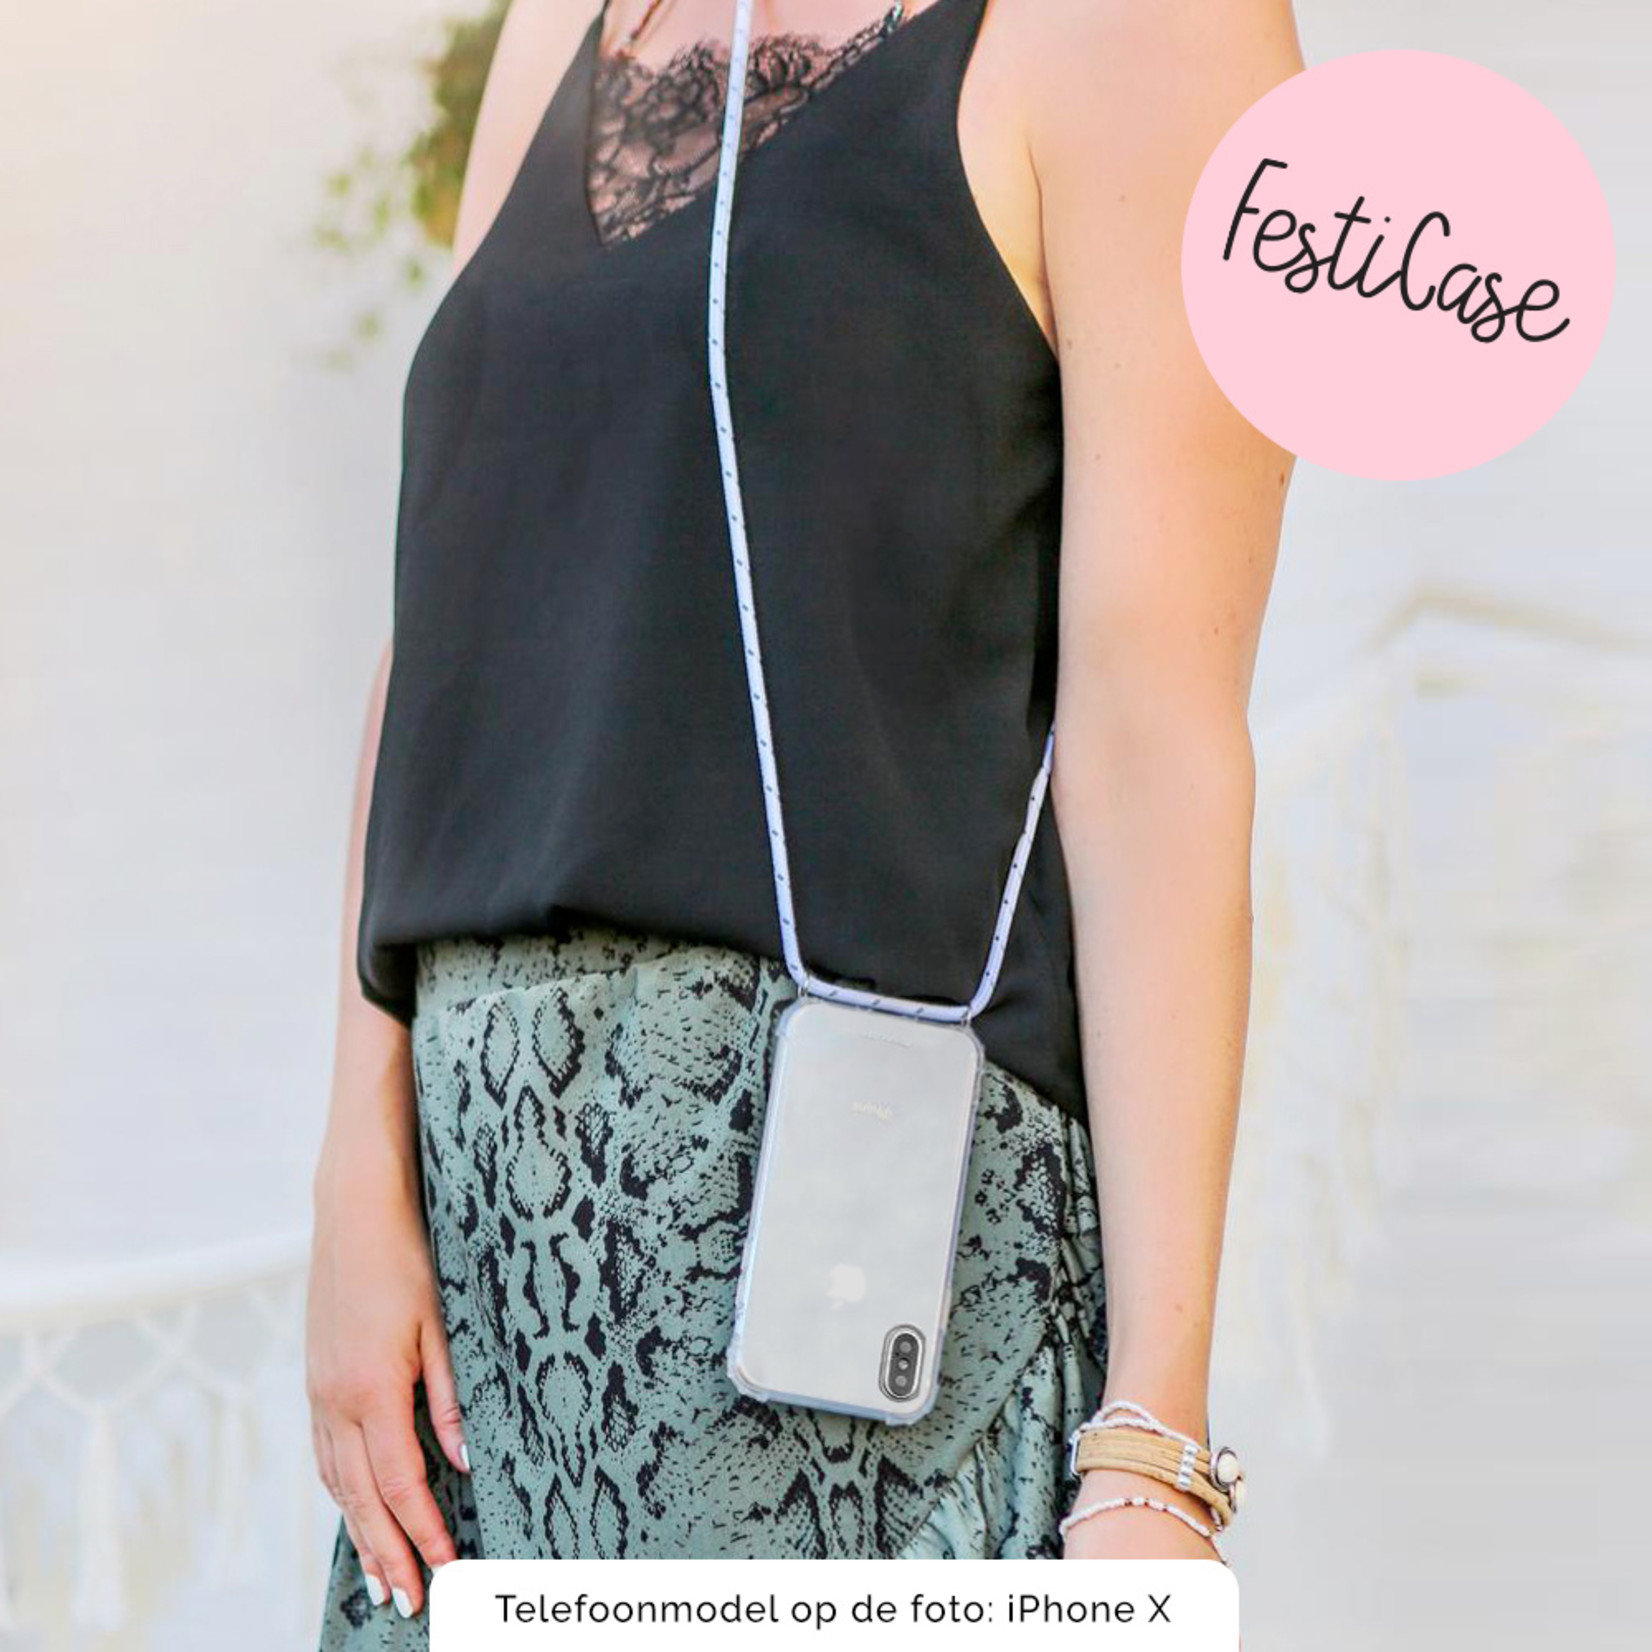 FOONCASE FESTICASE iPhone 8 Plus Telefoonhoesje met koord (Wit) TPU Soft Case - Transparant